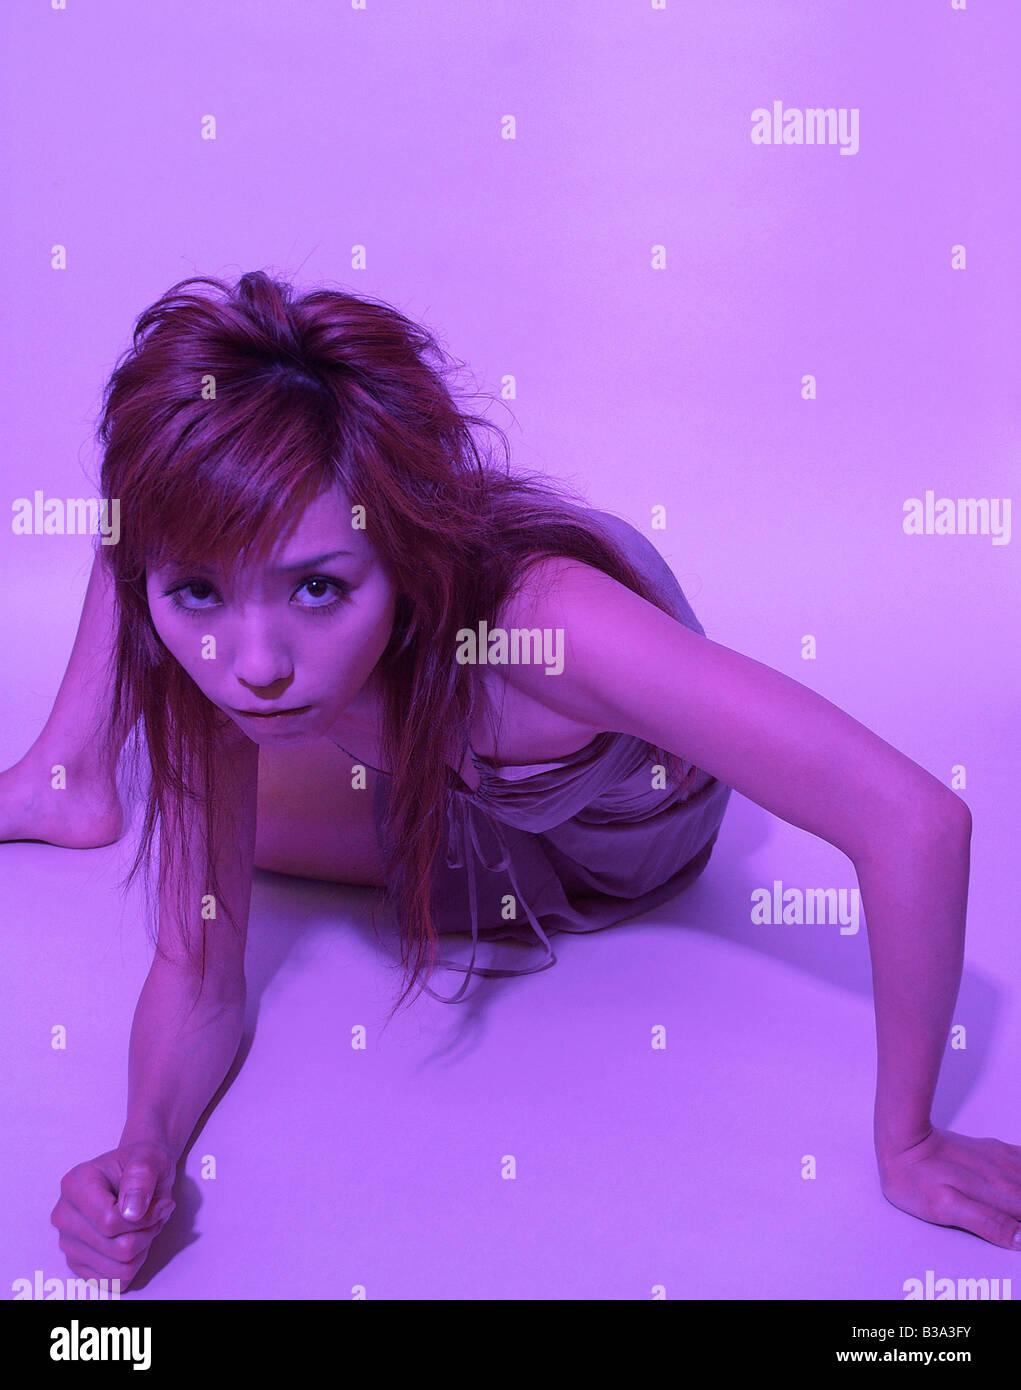 Woman in purple light lying in dramatic pose - Stock Image